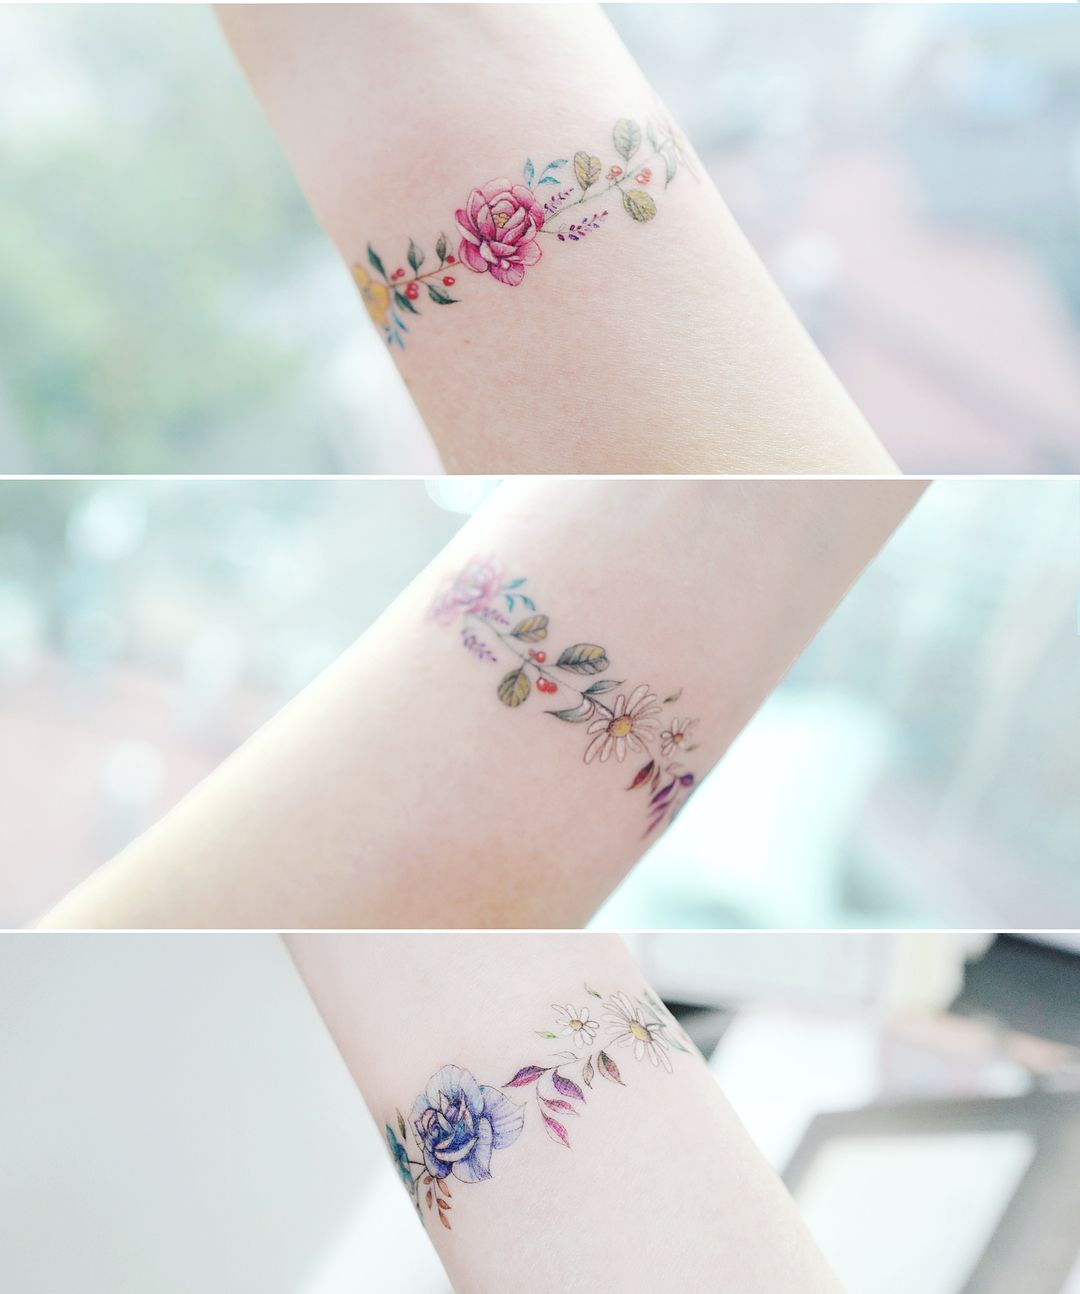 Floral Bracelet Wrist Tattoo Designs: Pin By Kay Hazlett On Tattoos